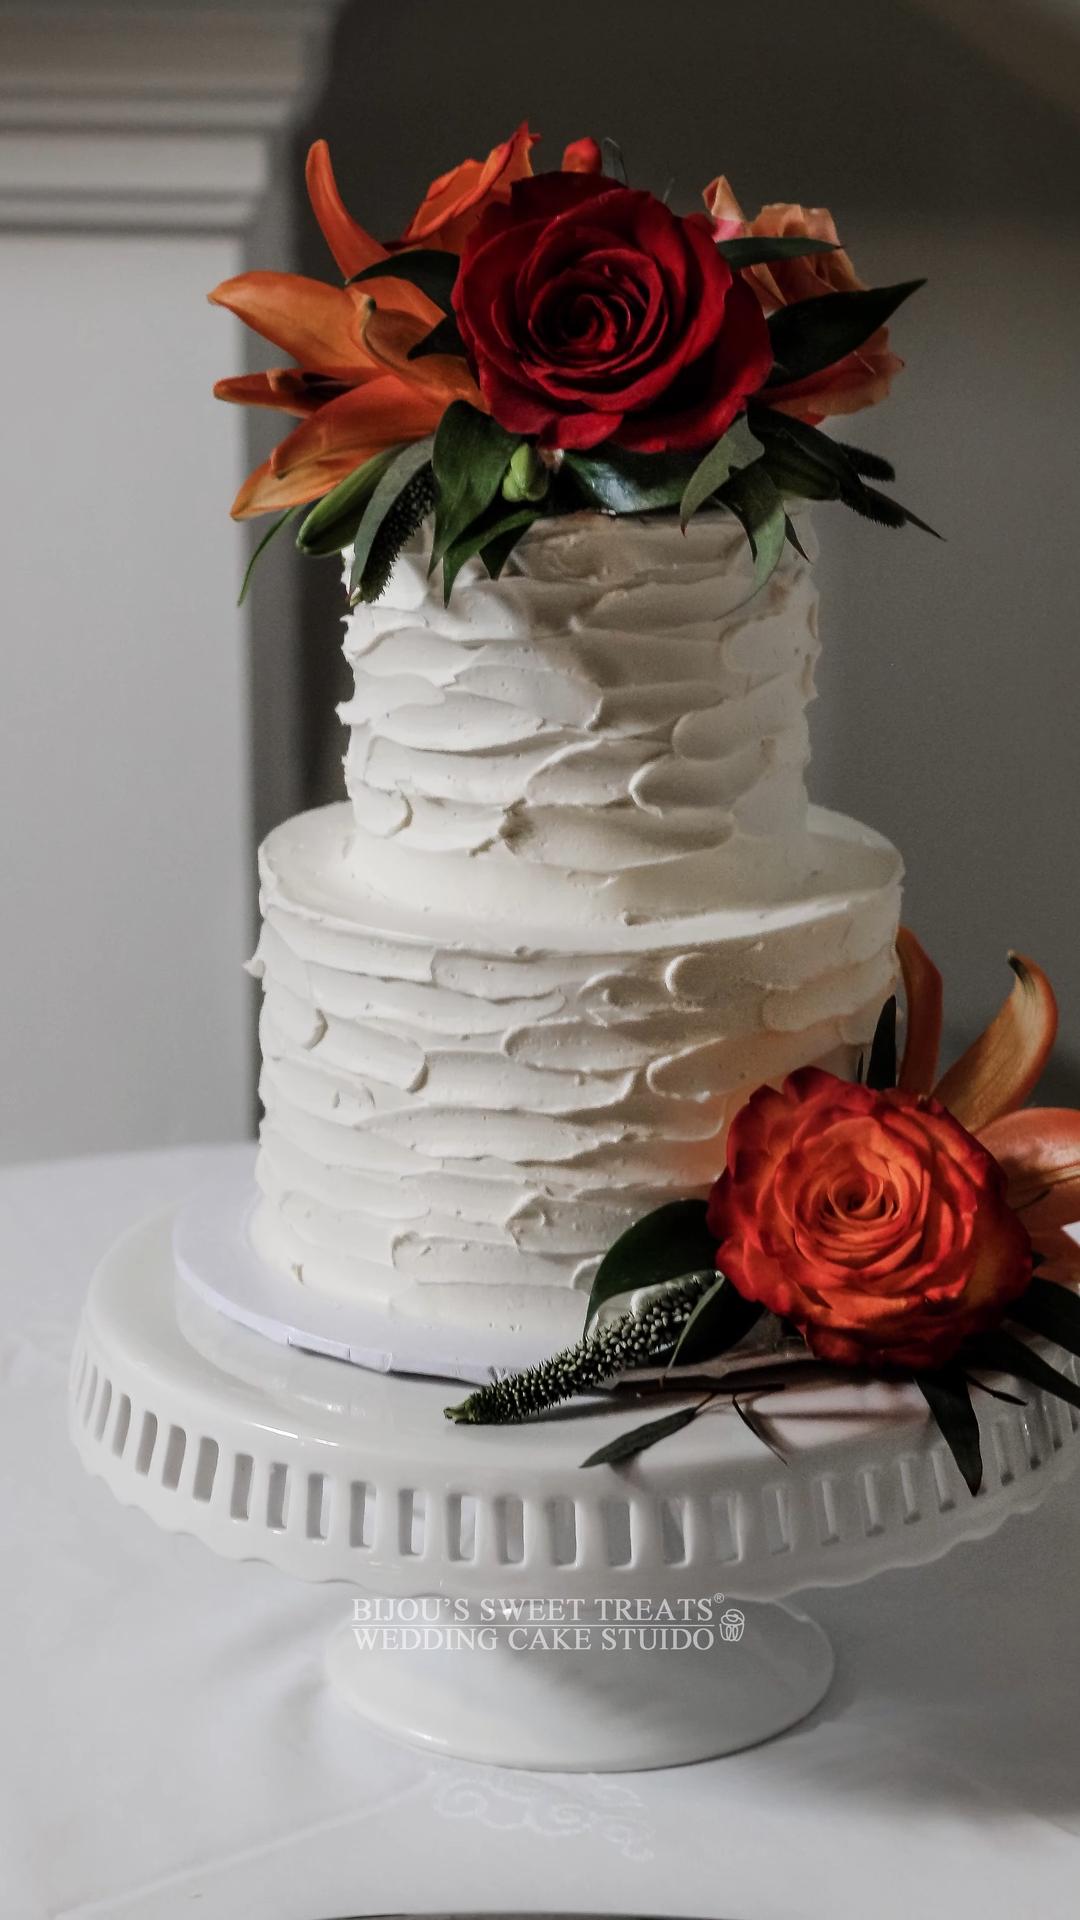 Classic textured buttercream wedding cake